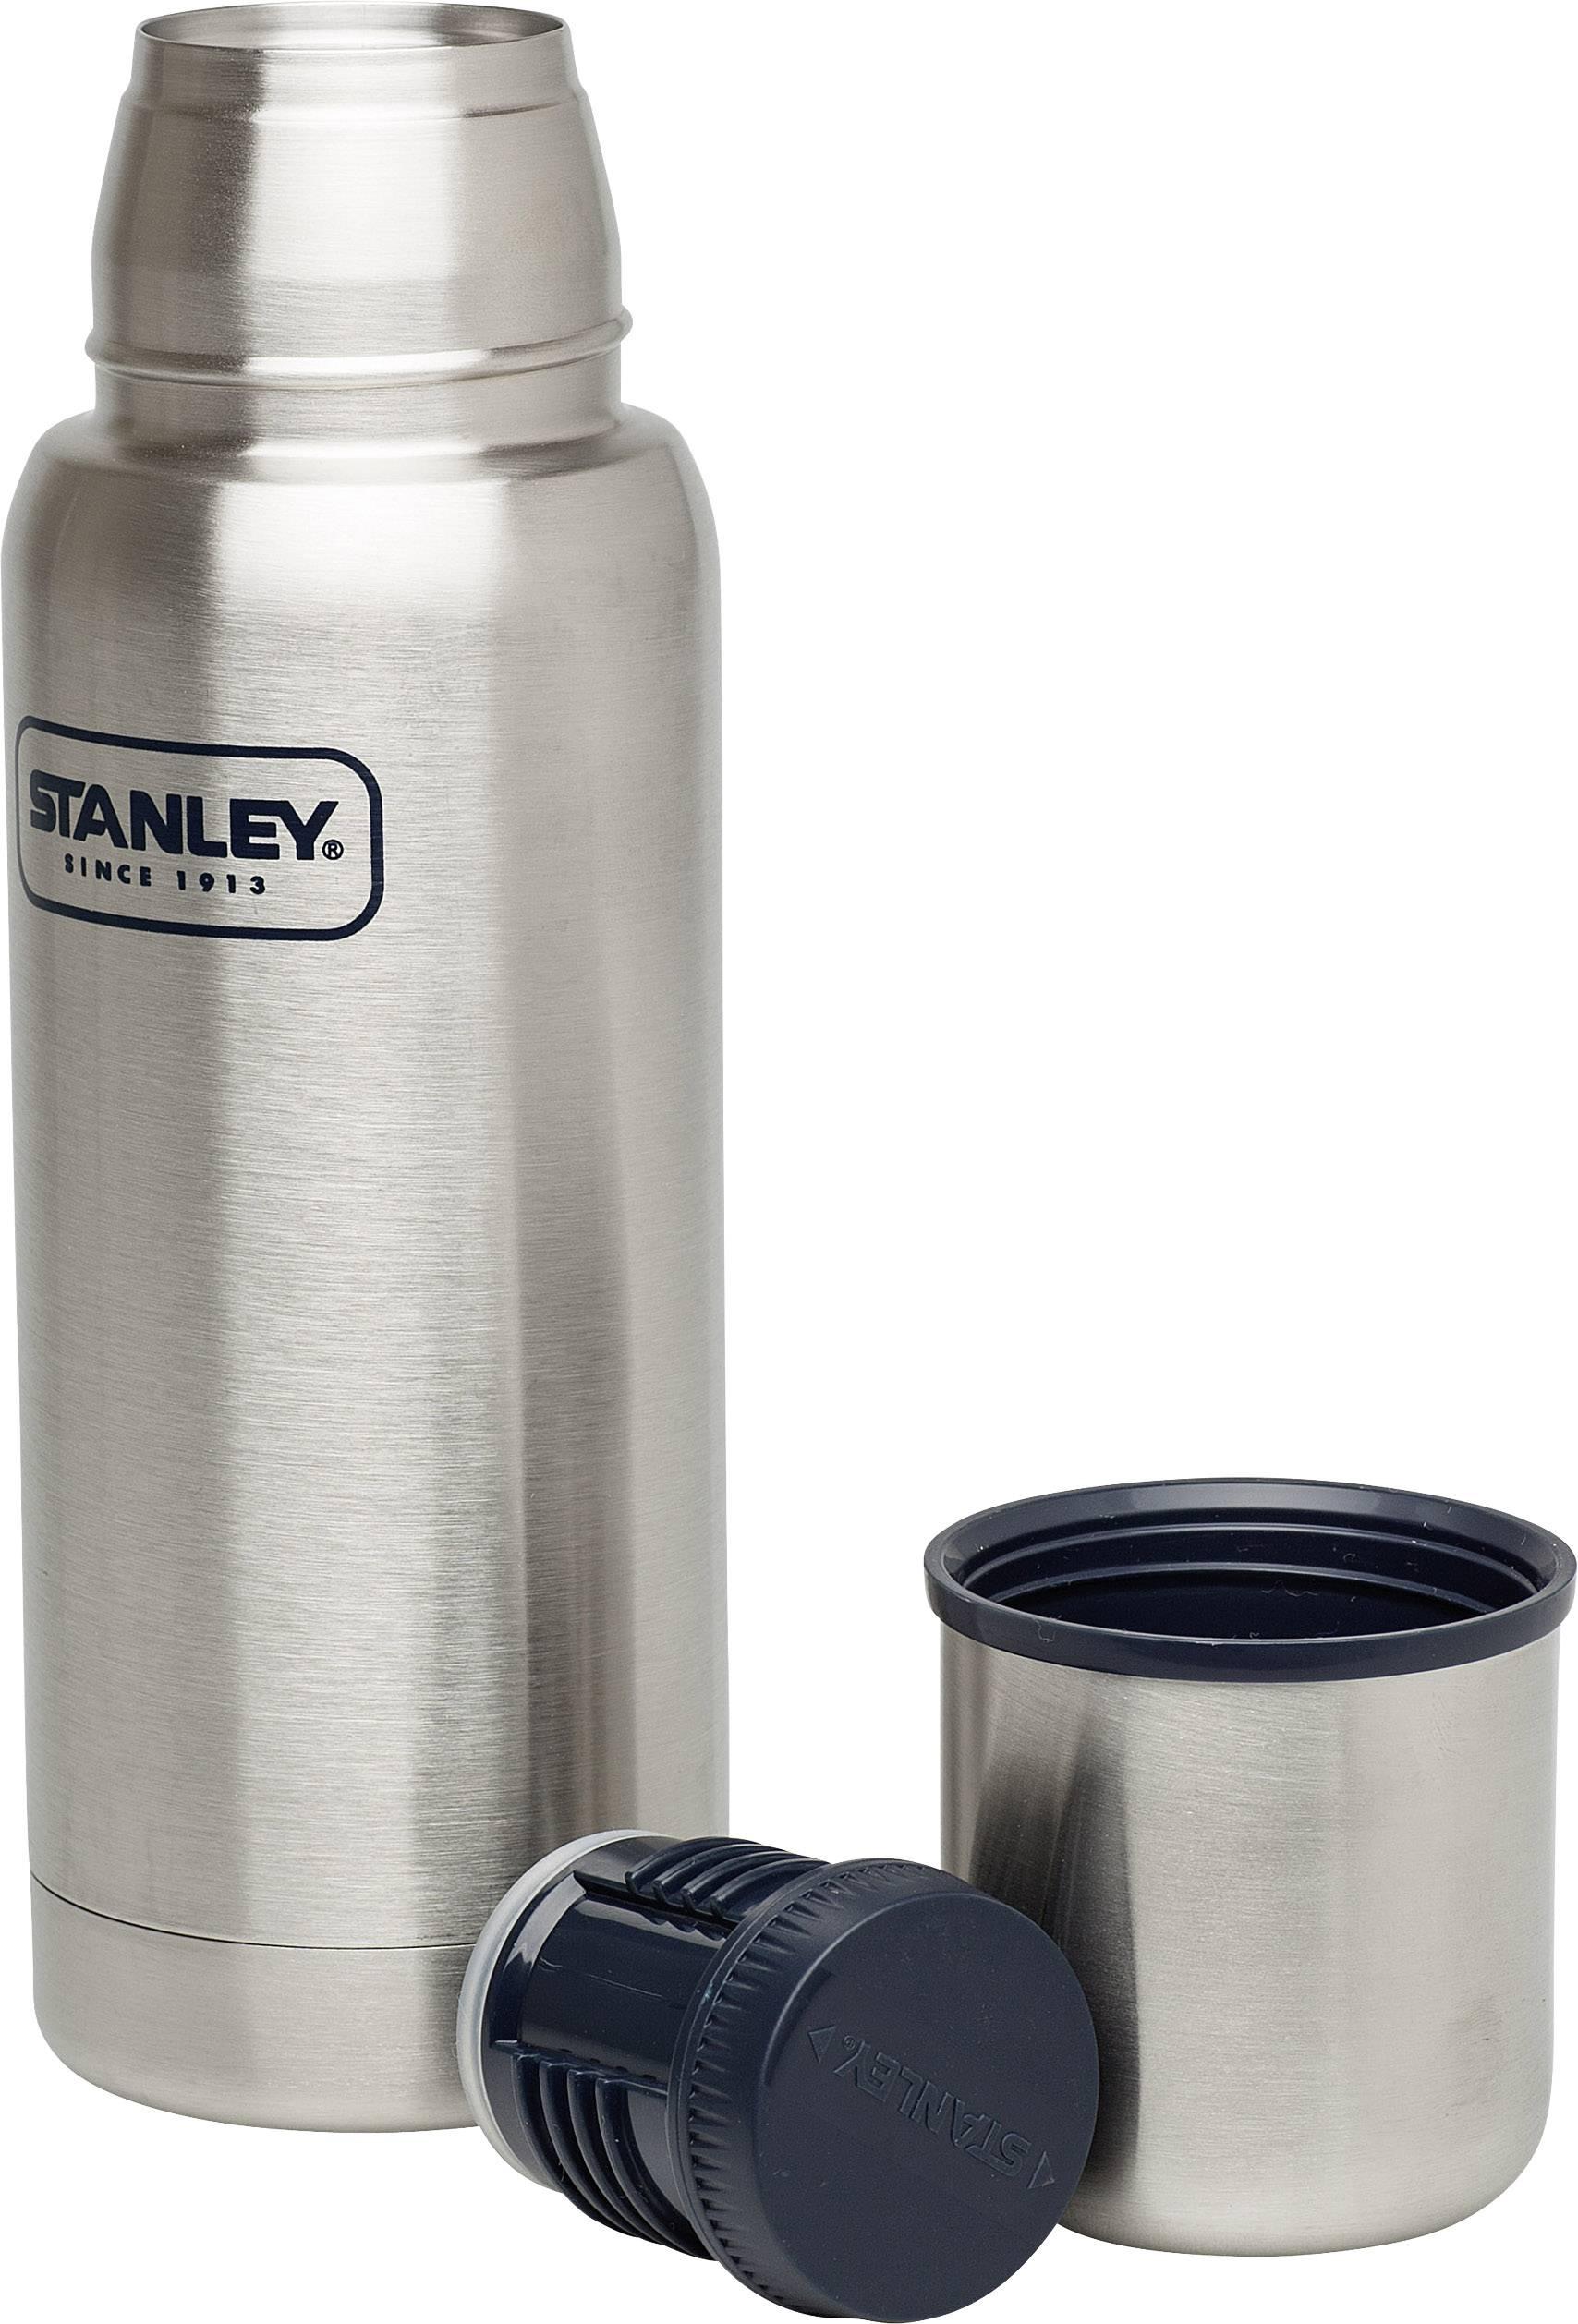 Stanley 10 01563 Blackamp; 007 By Bouteille Ml 503 Isotherme Decker jqzUGSpLMV